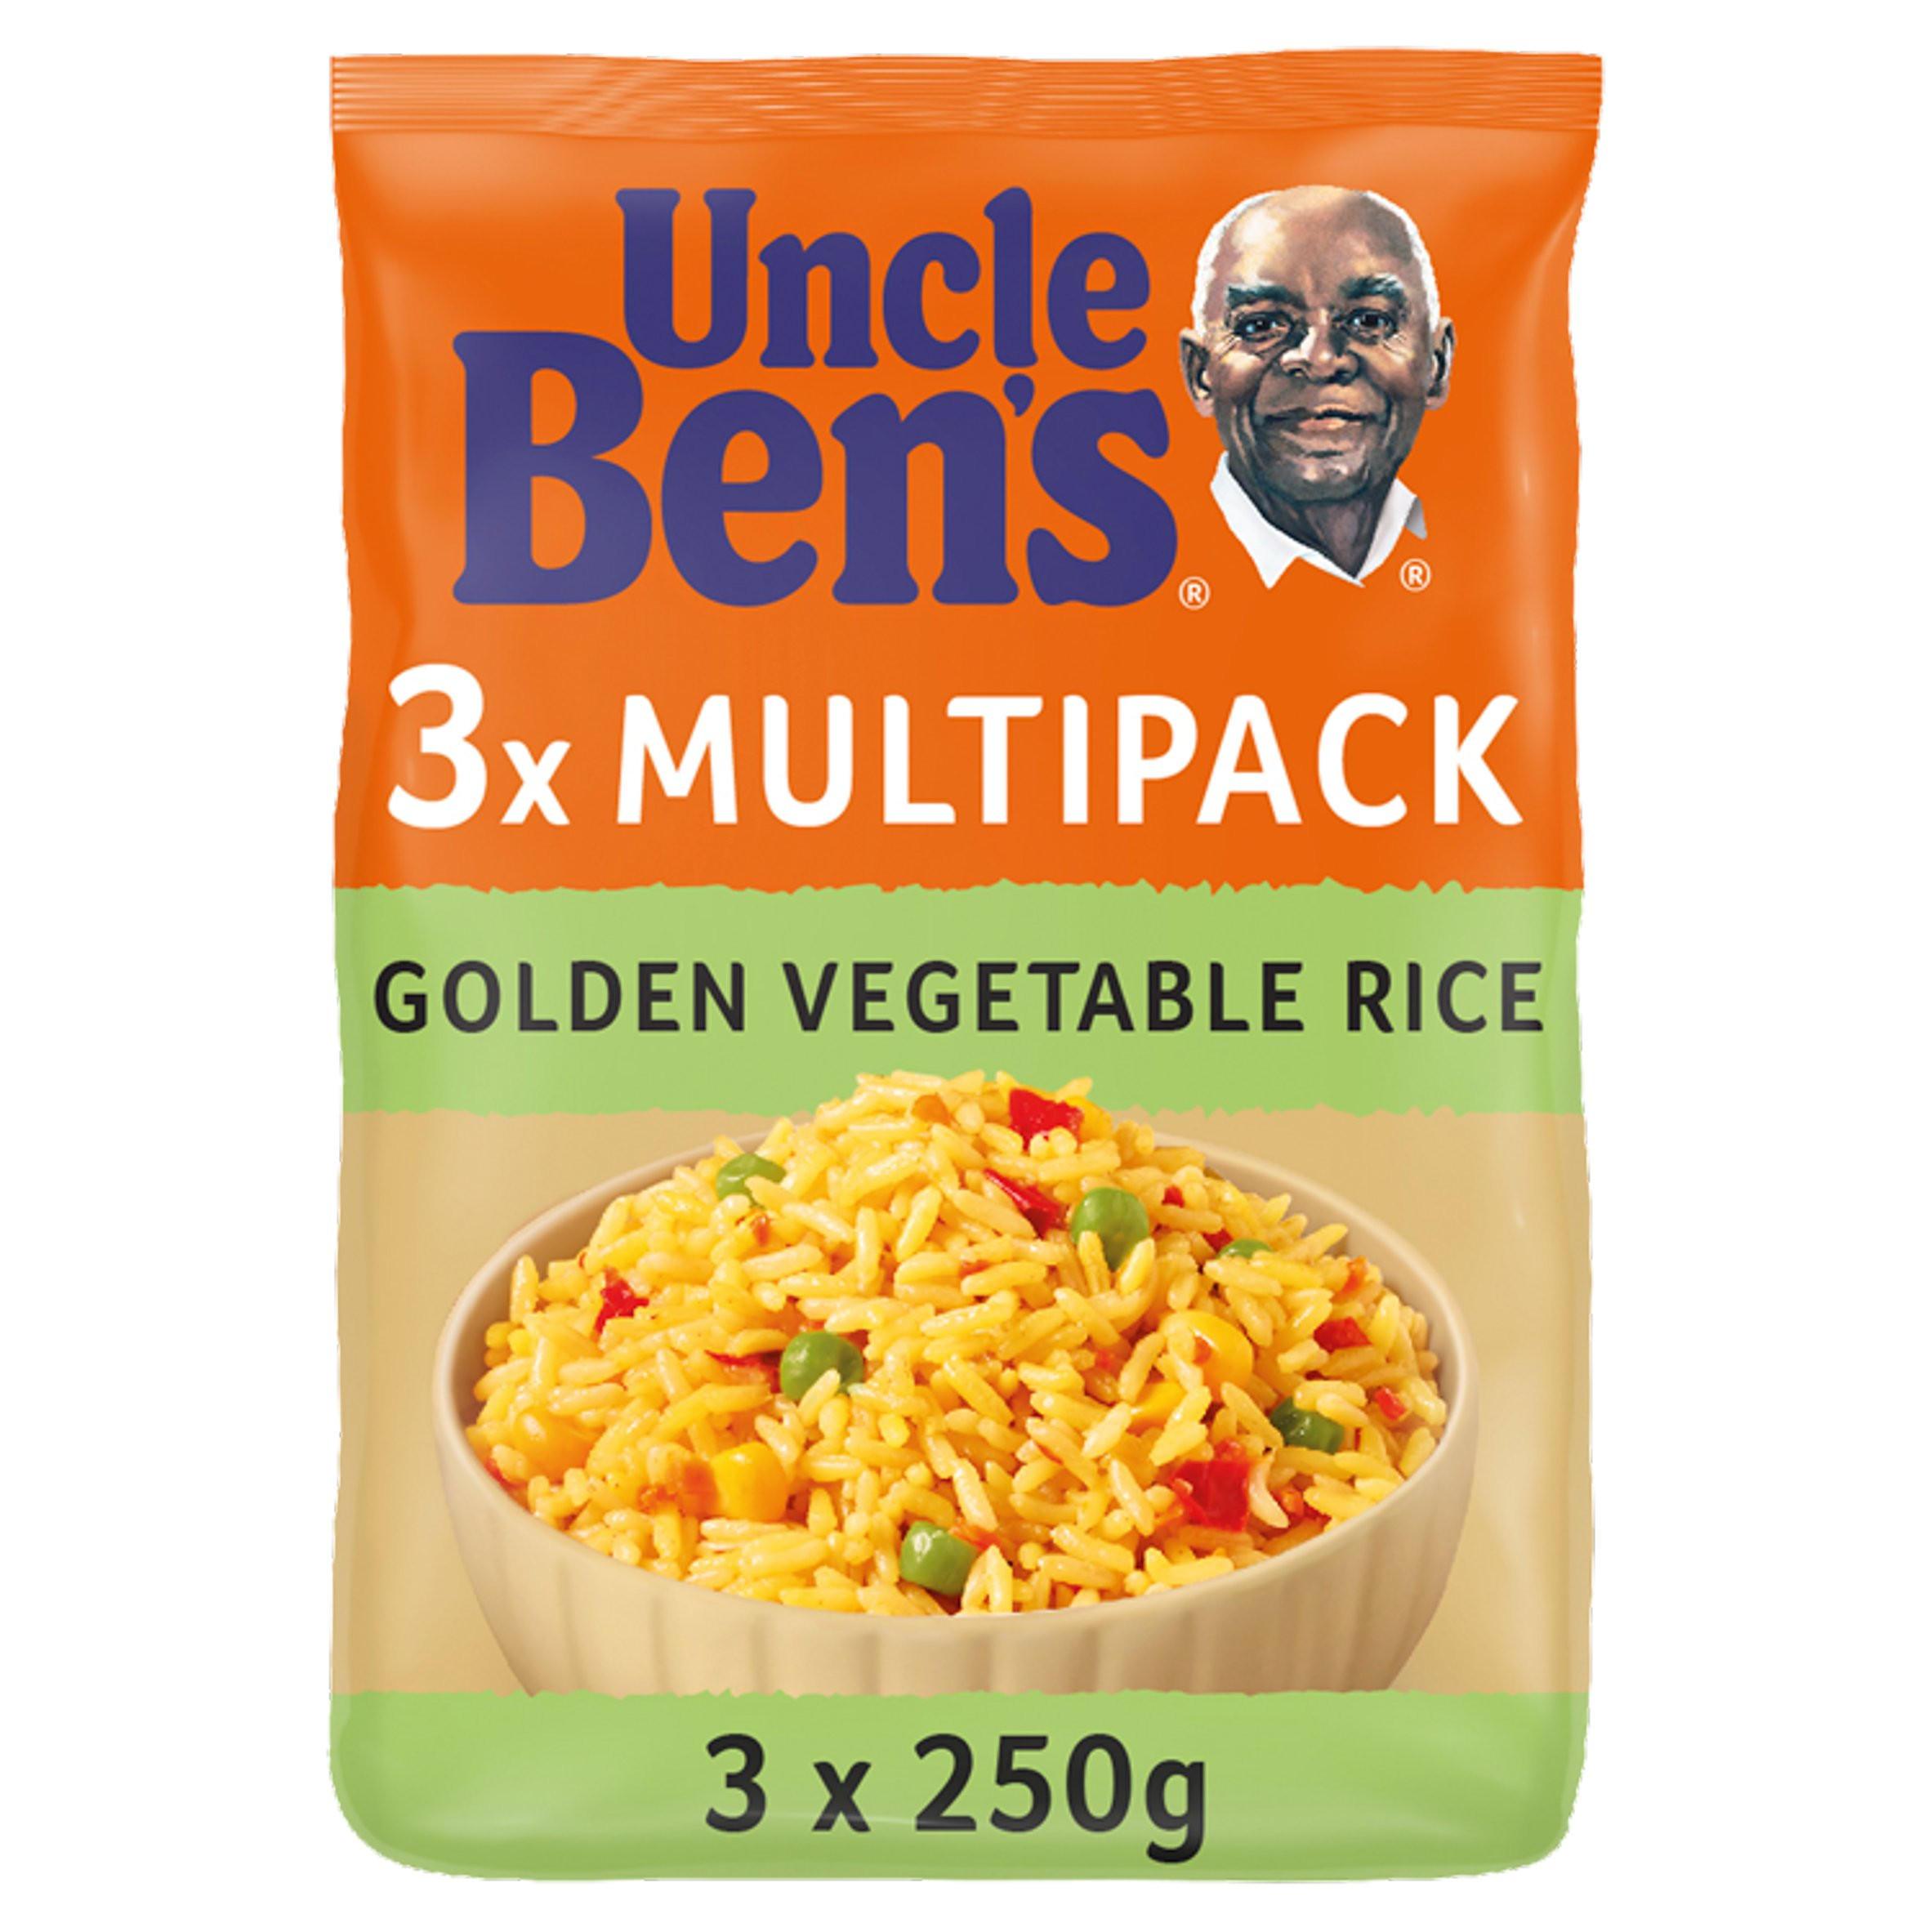 uncle bens golden vegetable microwave